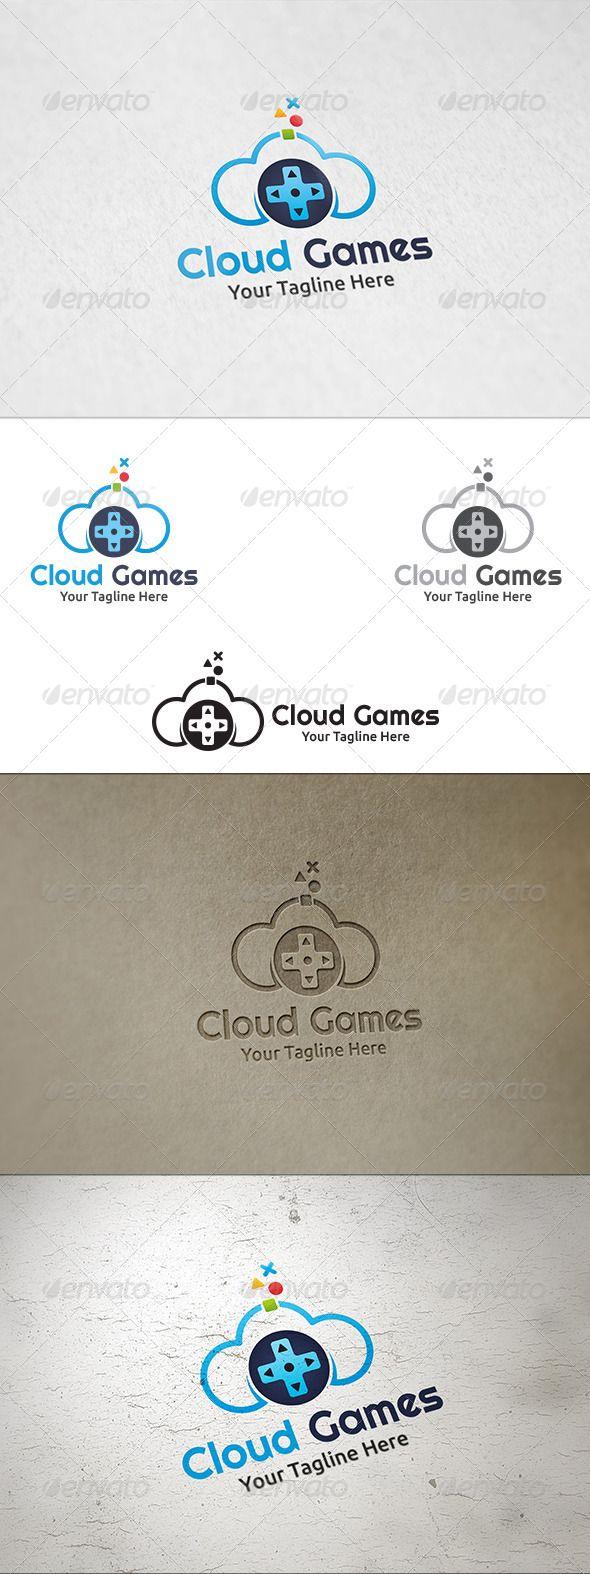 Cloud Games - Logo Template